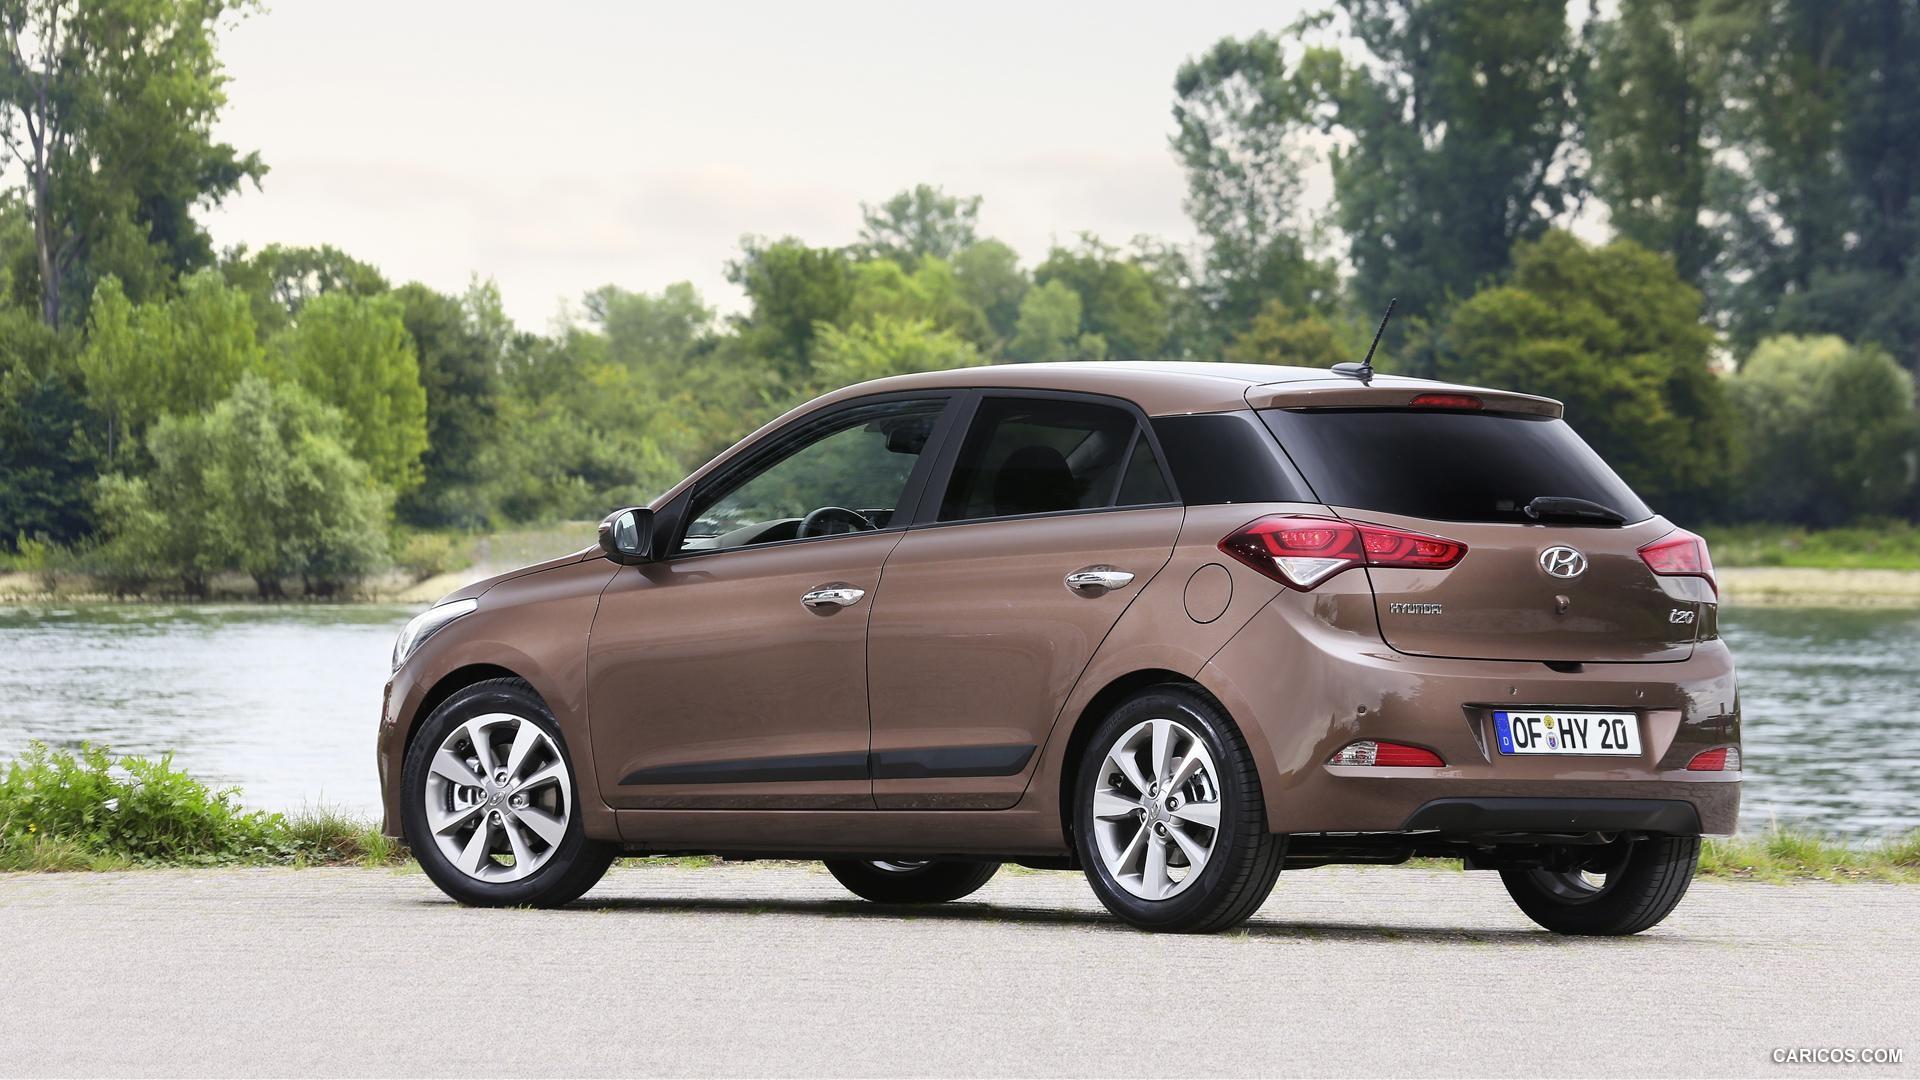 Hyundai i20 Pics